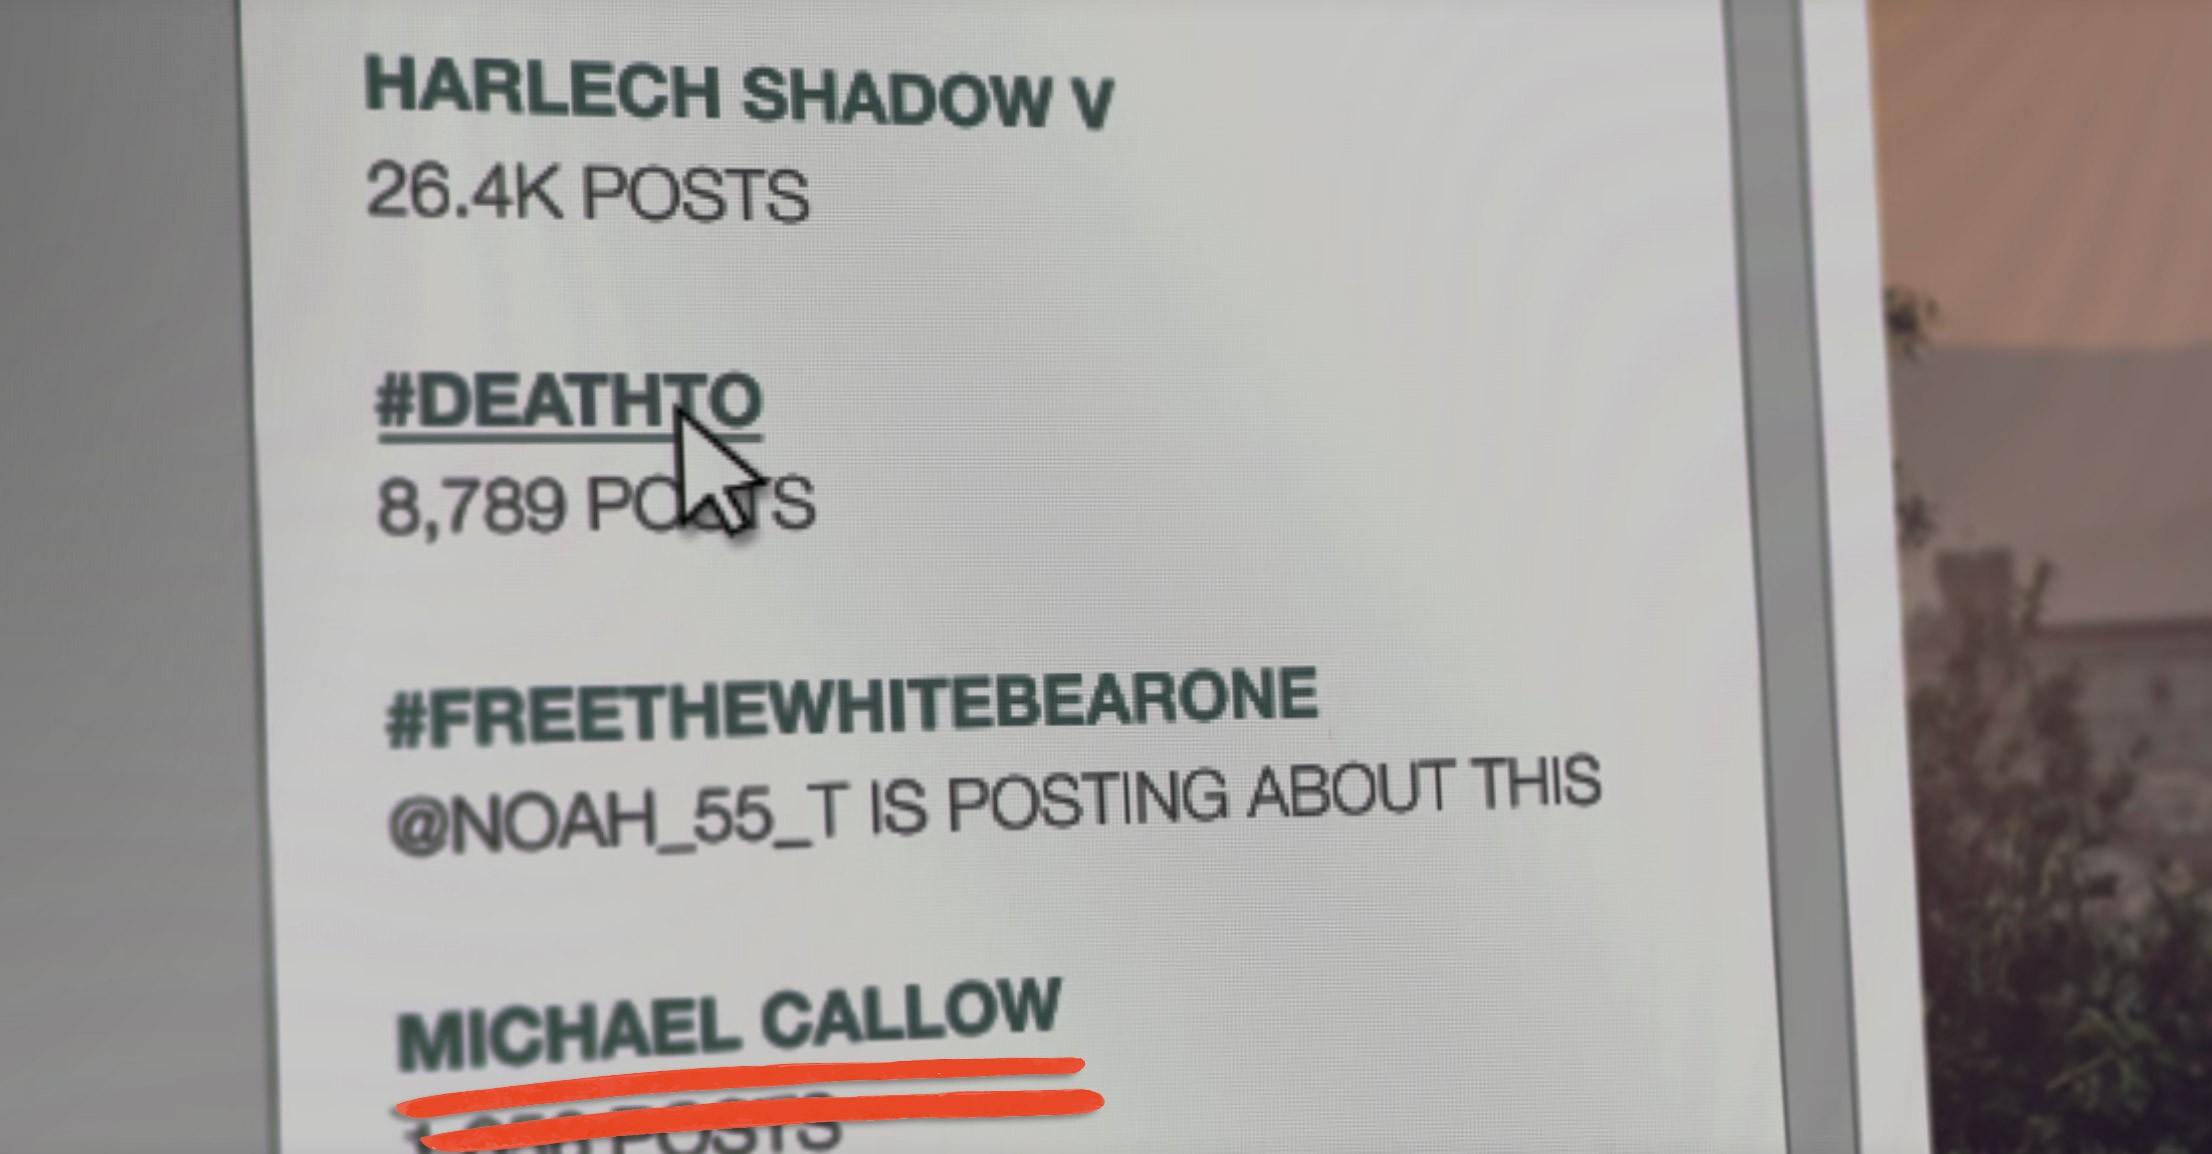 Michael callow